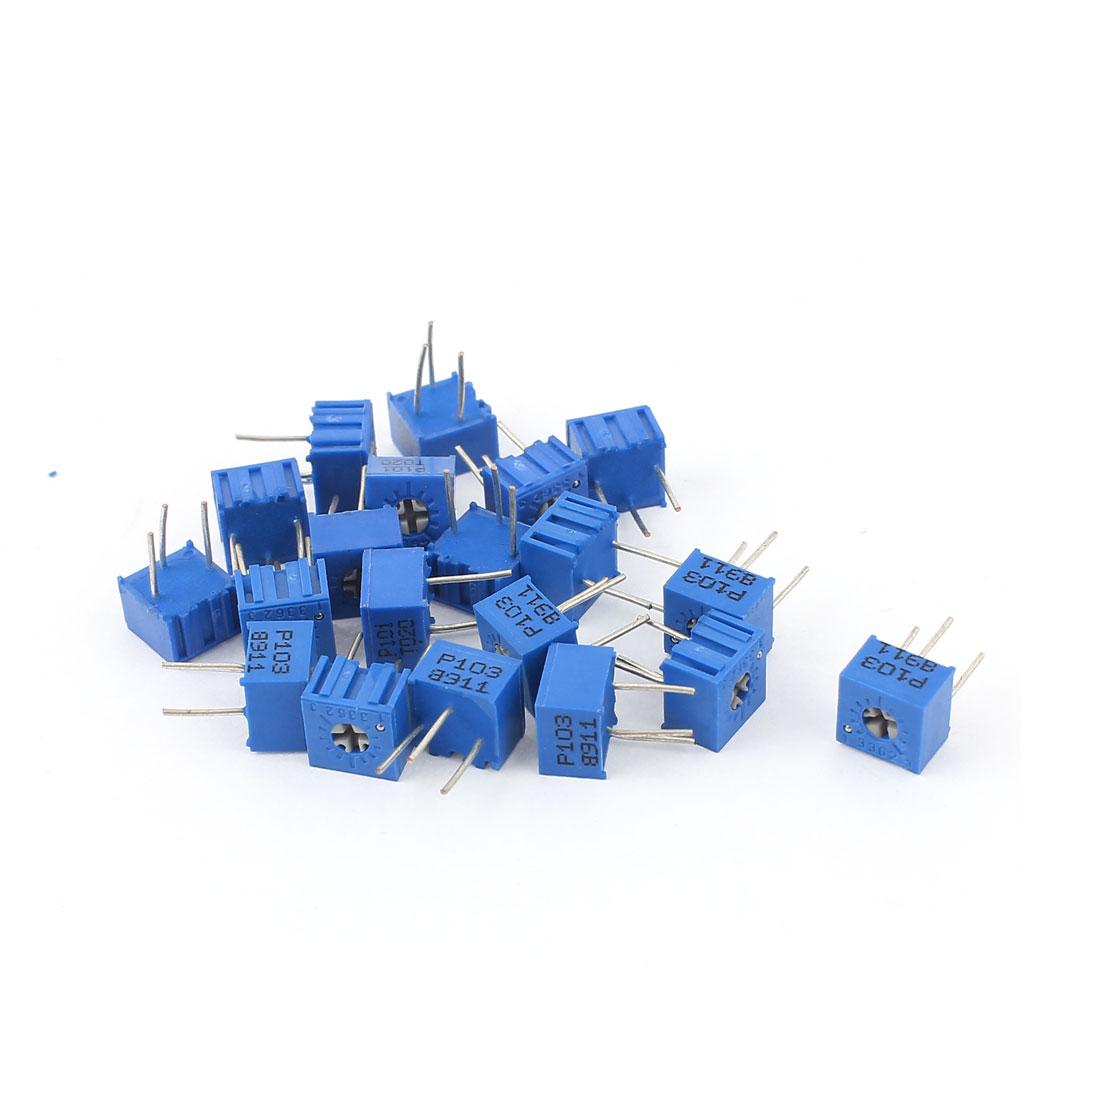 20Pcs Potentiometer Trimmer Variable Resistor 3362P-103 3362P-101